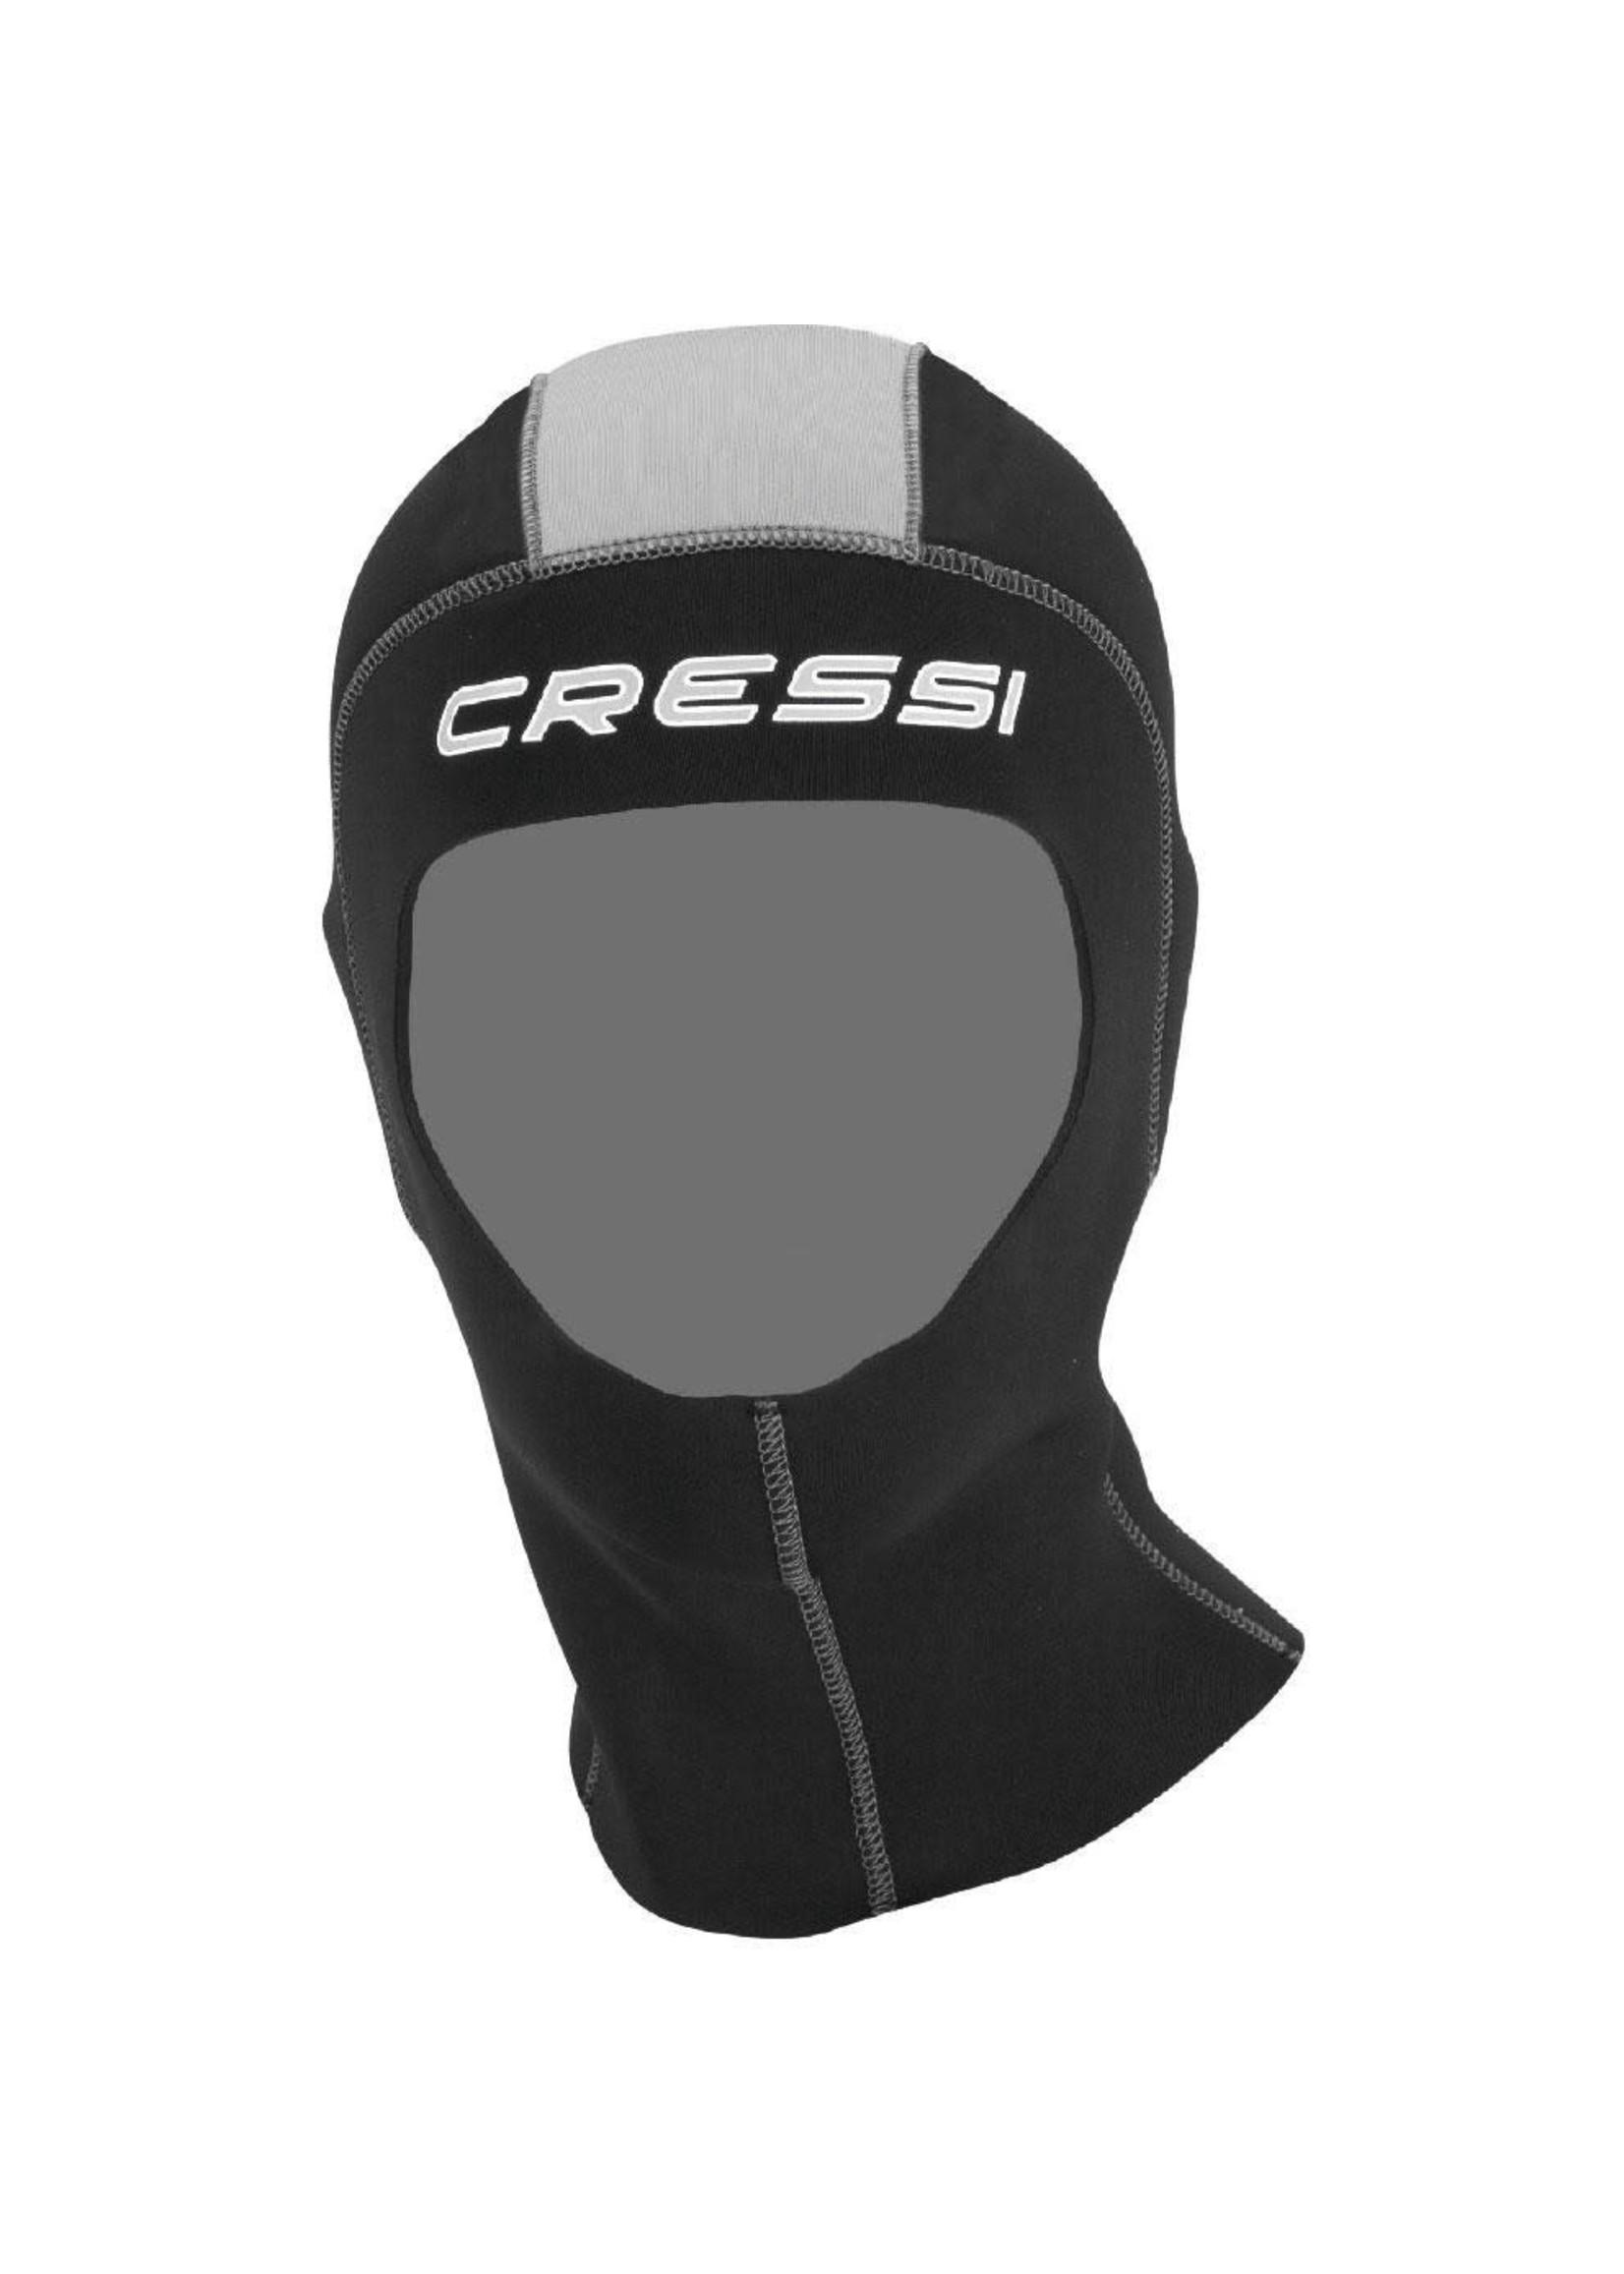 Cressi Cressi Atelier Comfort All-in-One 5mm - man